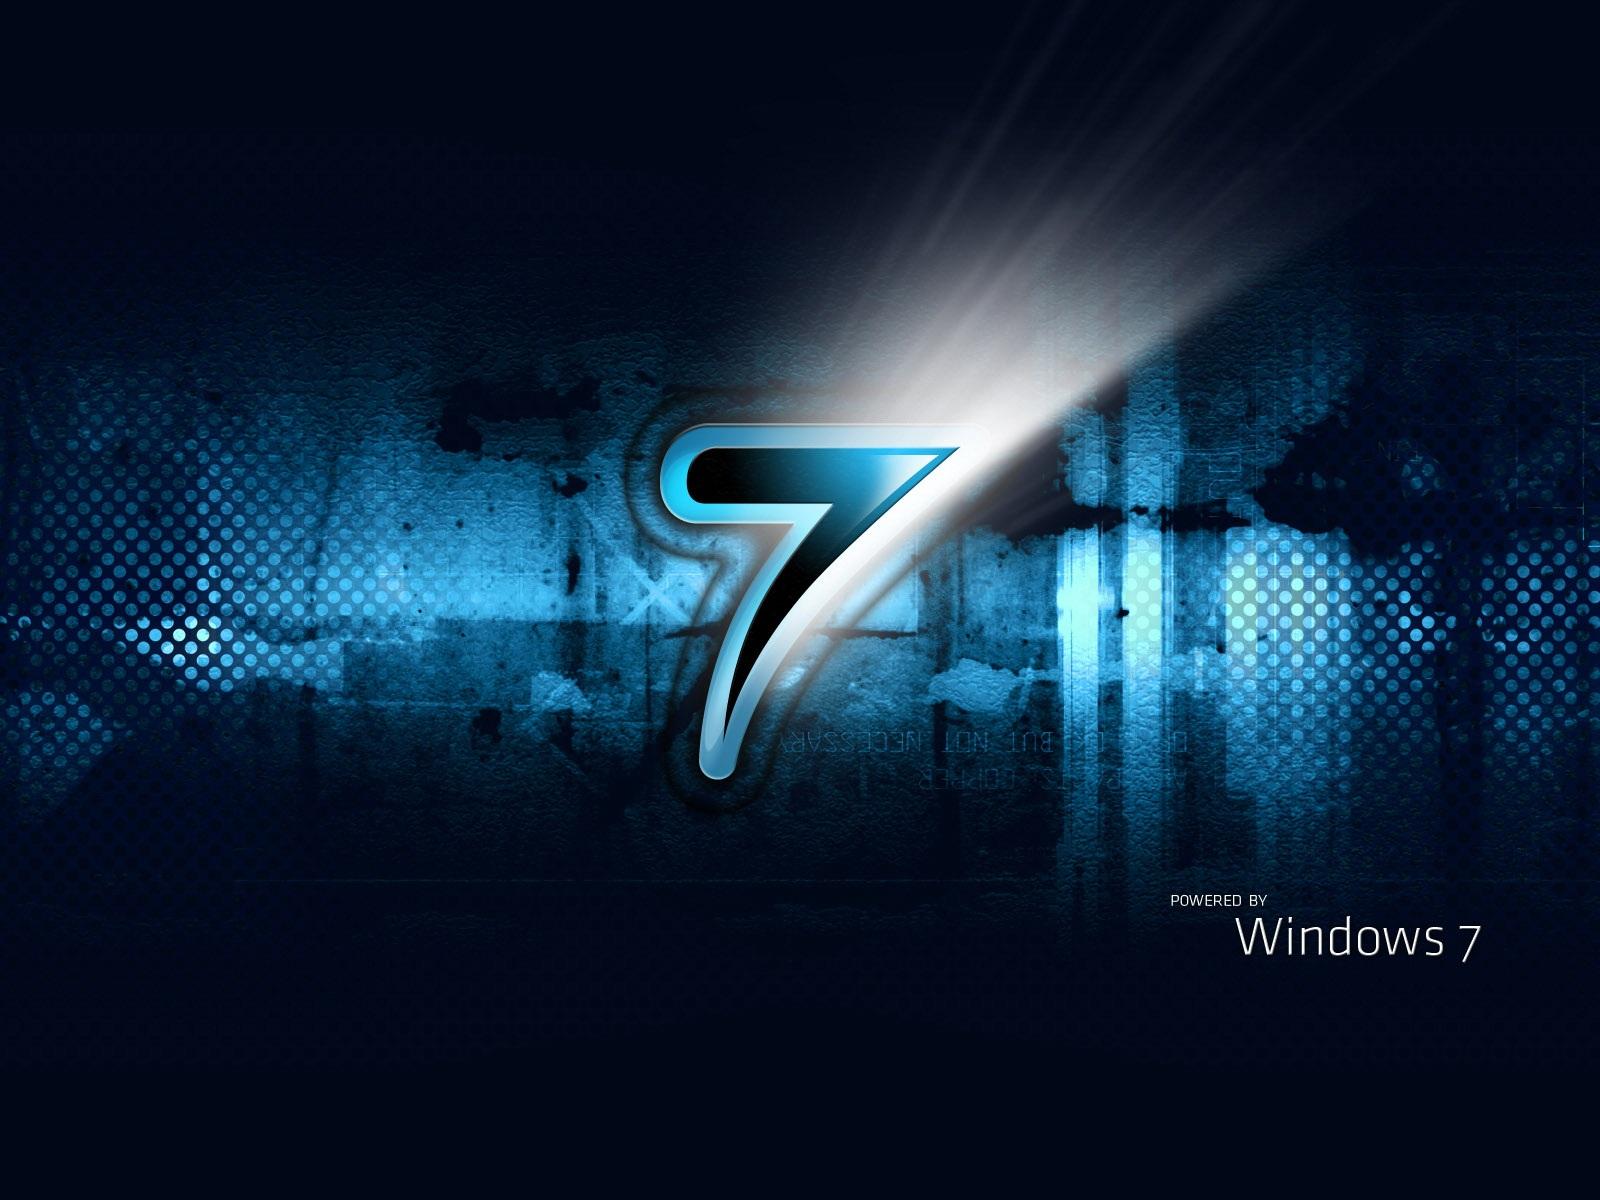 Wallpaper Windows7 Three Dimensional Blue Black 1920x1200 HD Picture